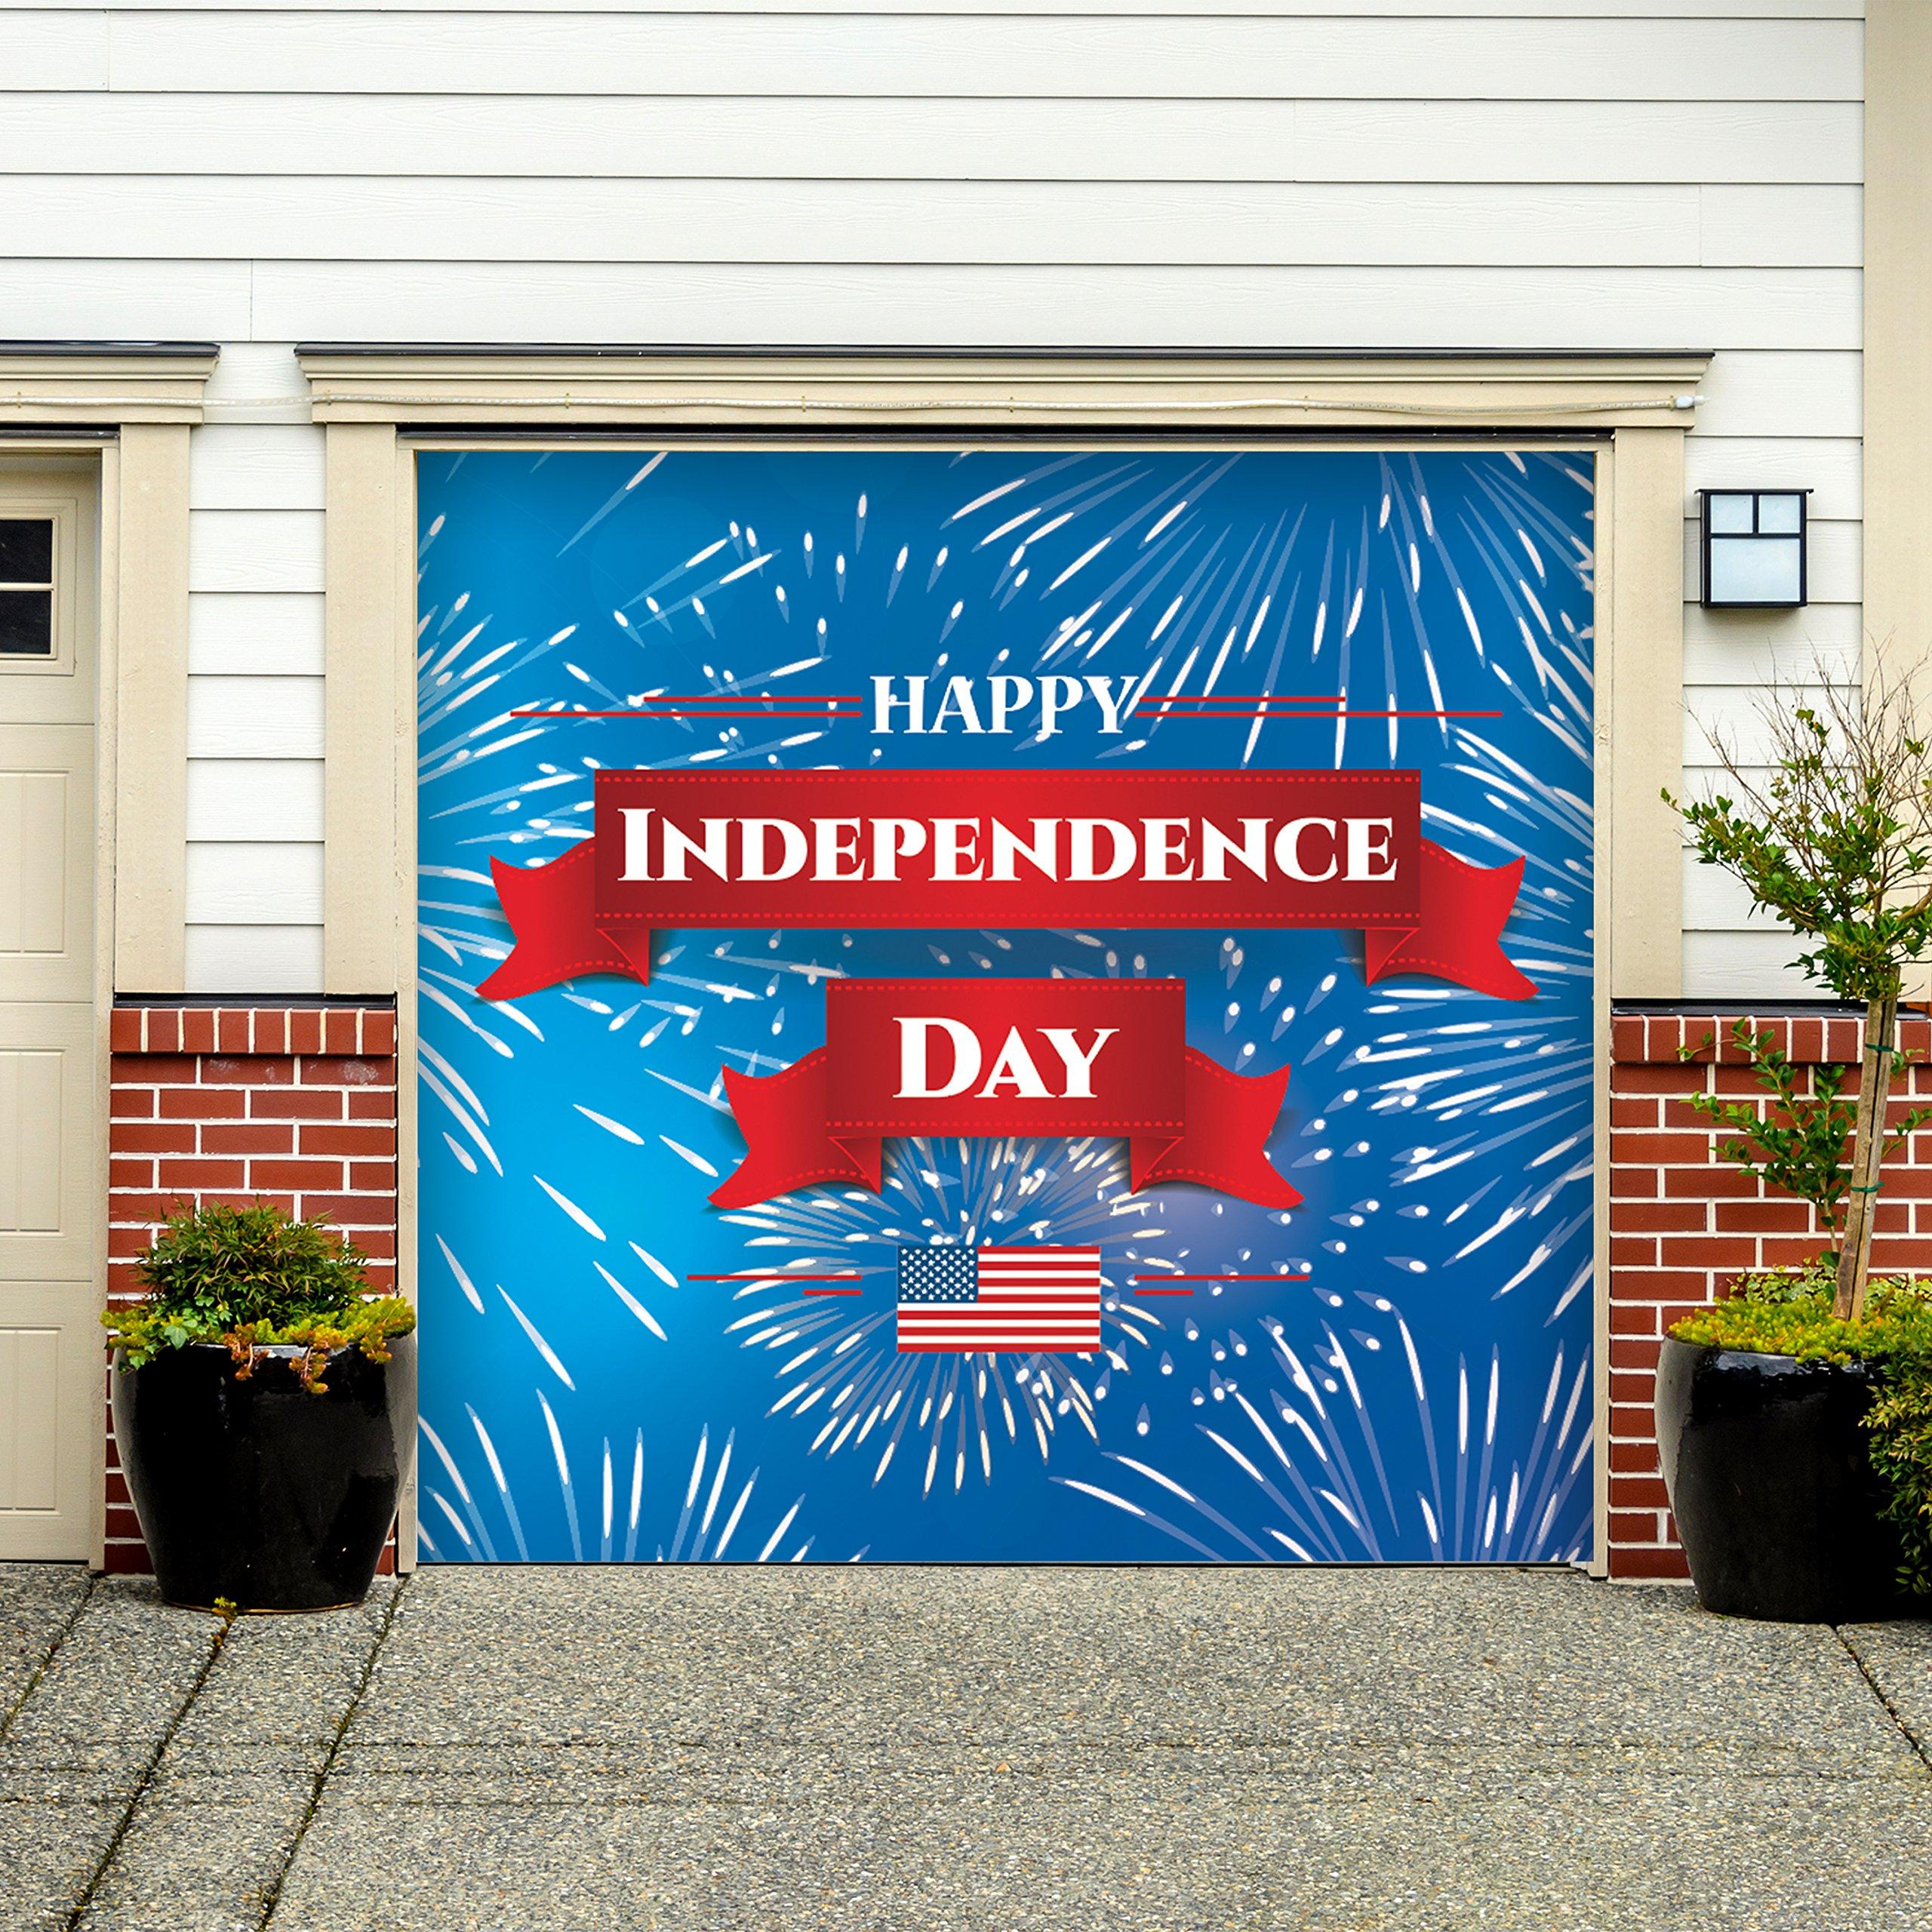 Outdoor Patriotic American Holiday Garage Door Banner Cover Mural Décoration - Fireworks Happy Independence Day - Outdoor American Holiday Garage Door Banner Décor Sign 7'x 8'